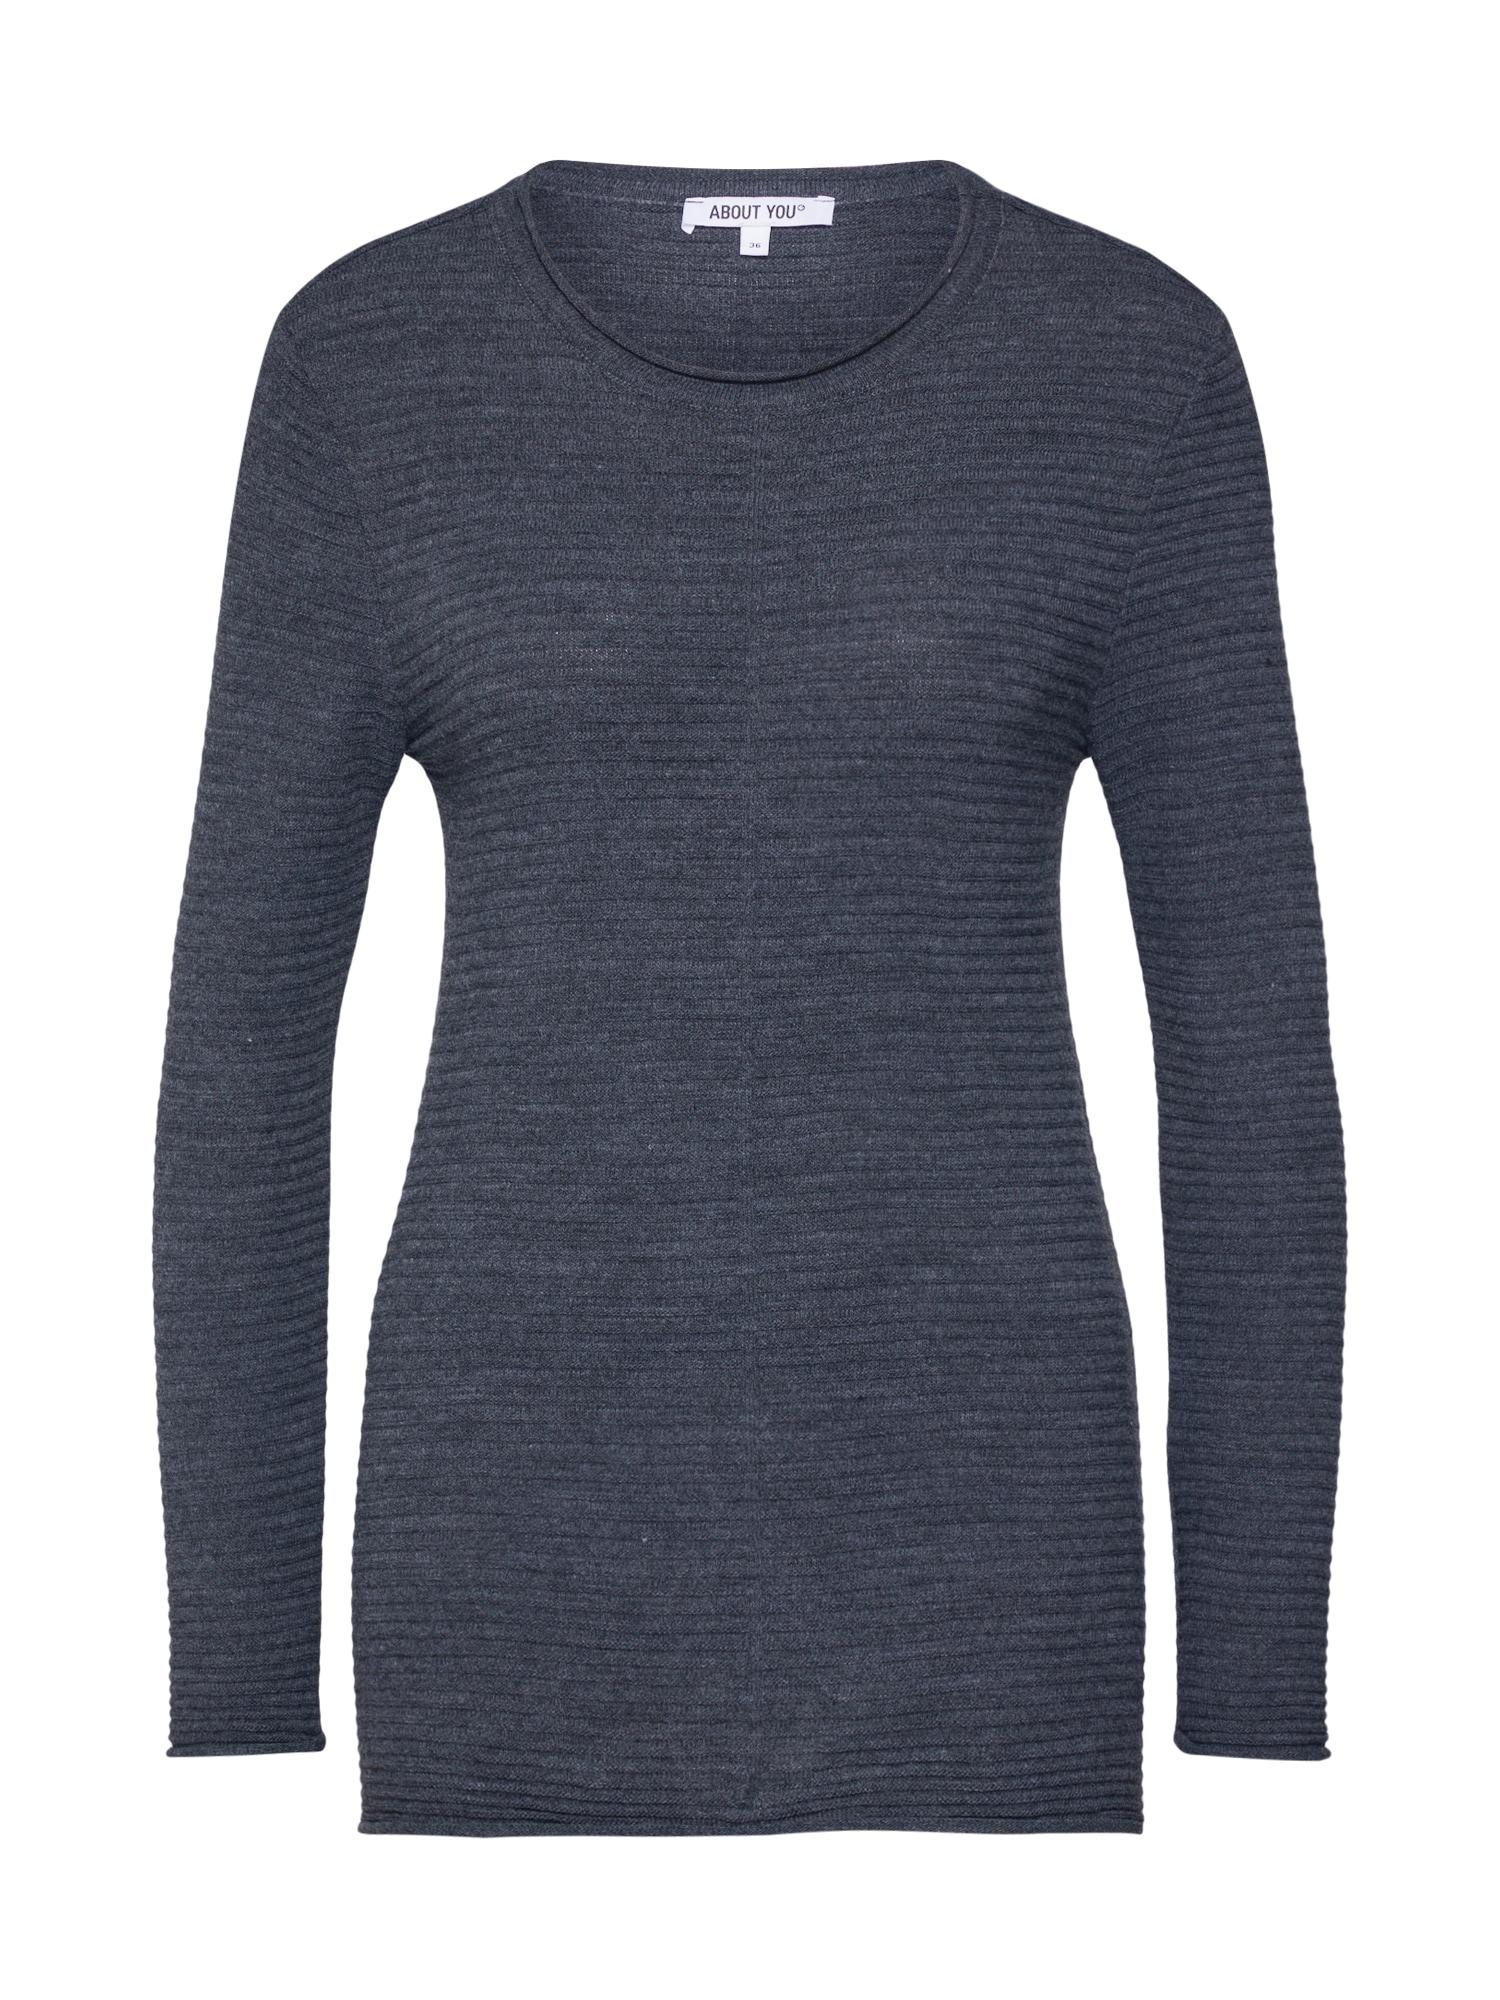 ABOUT YOU Megztinis 'Julika' margai pilka